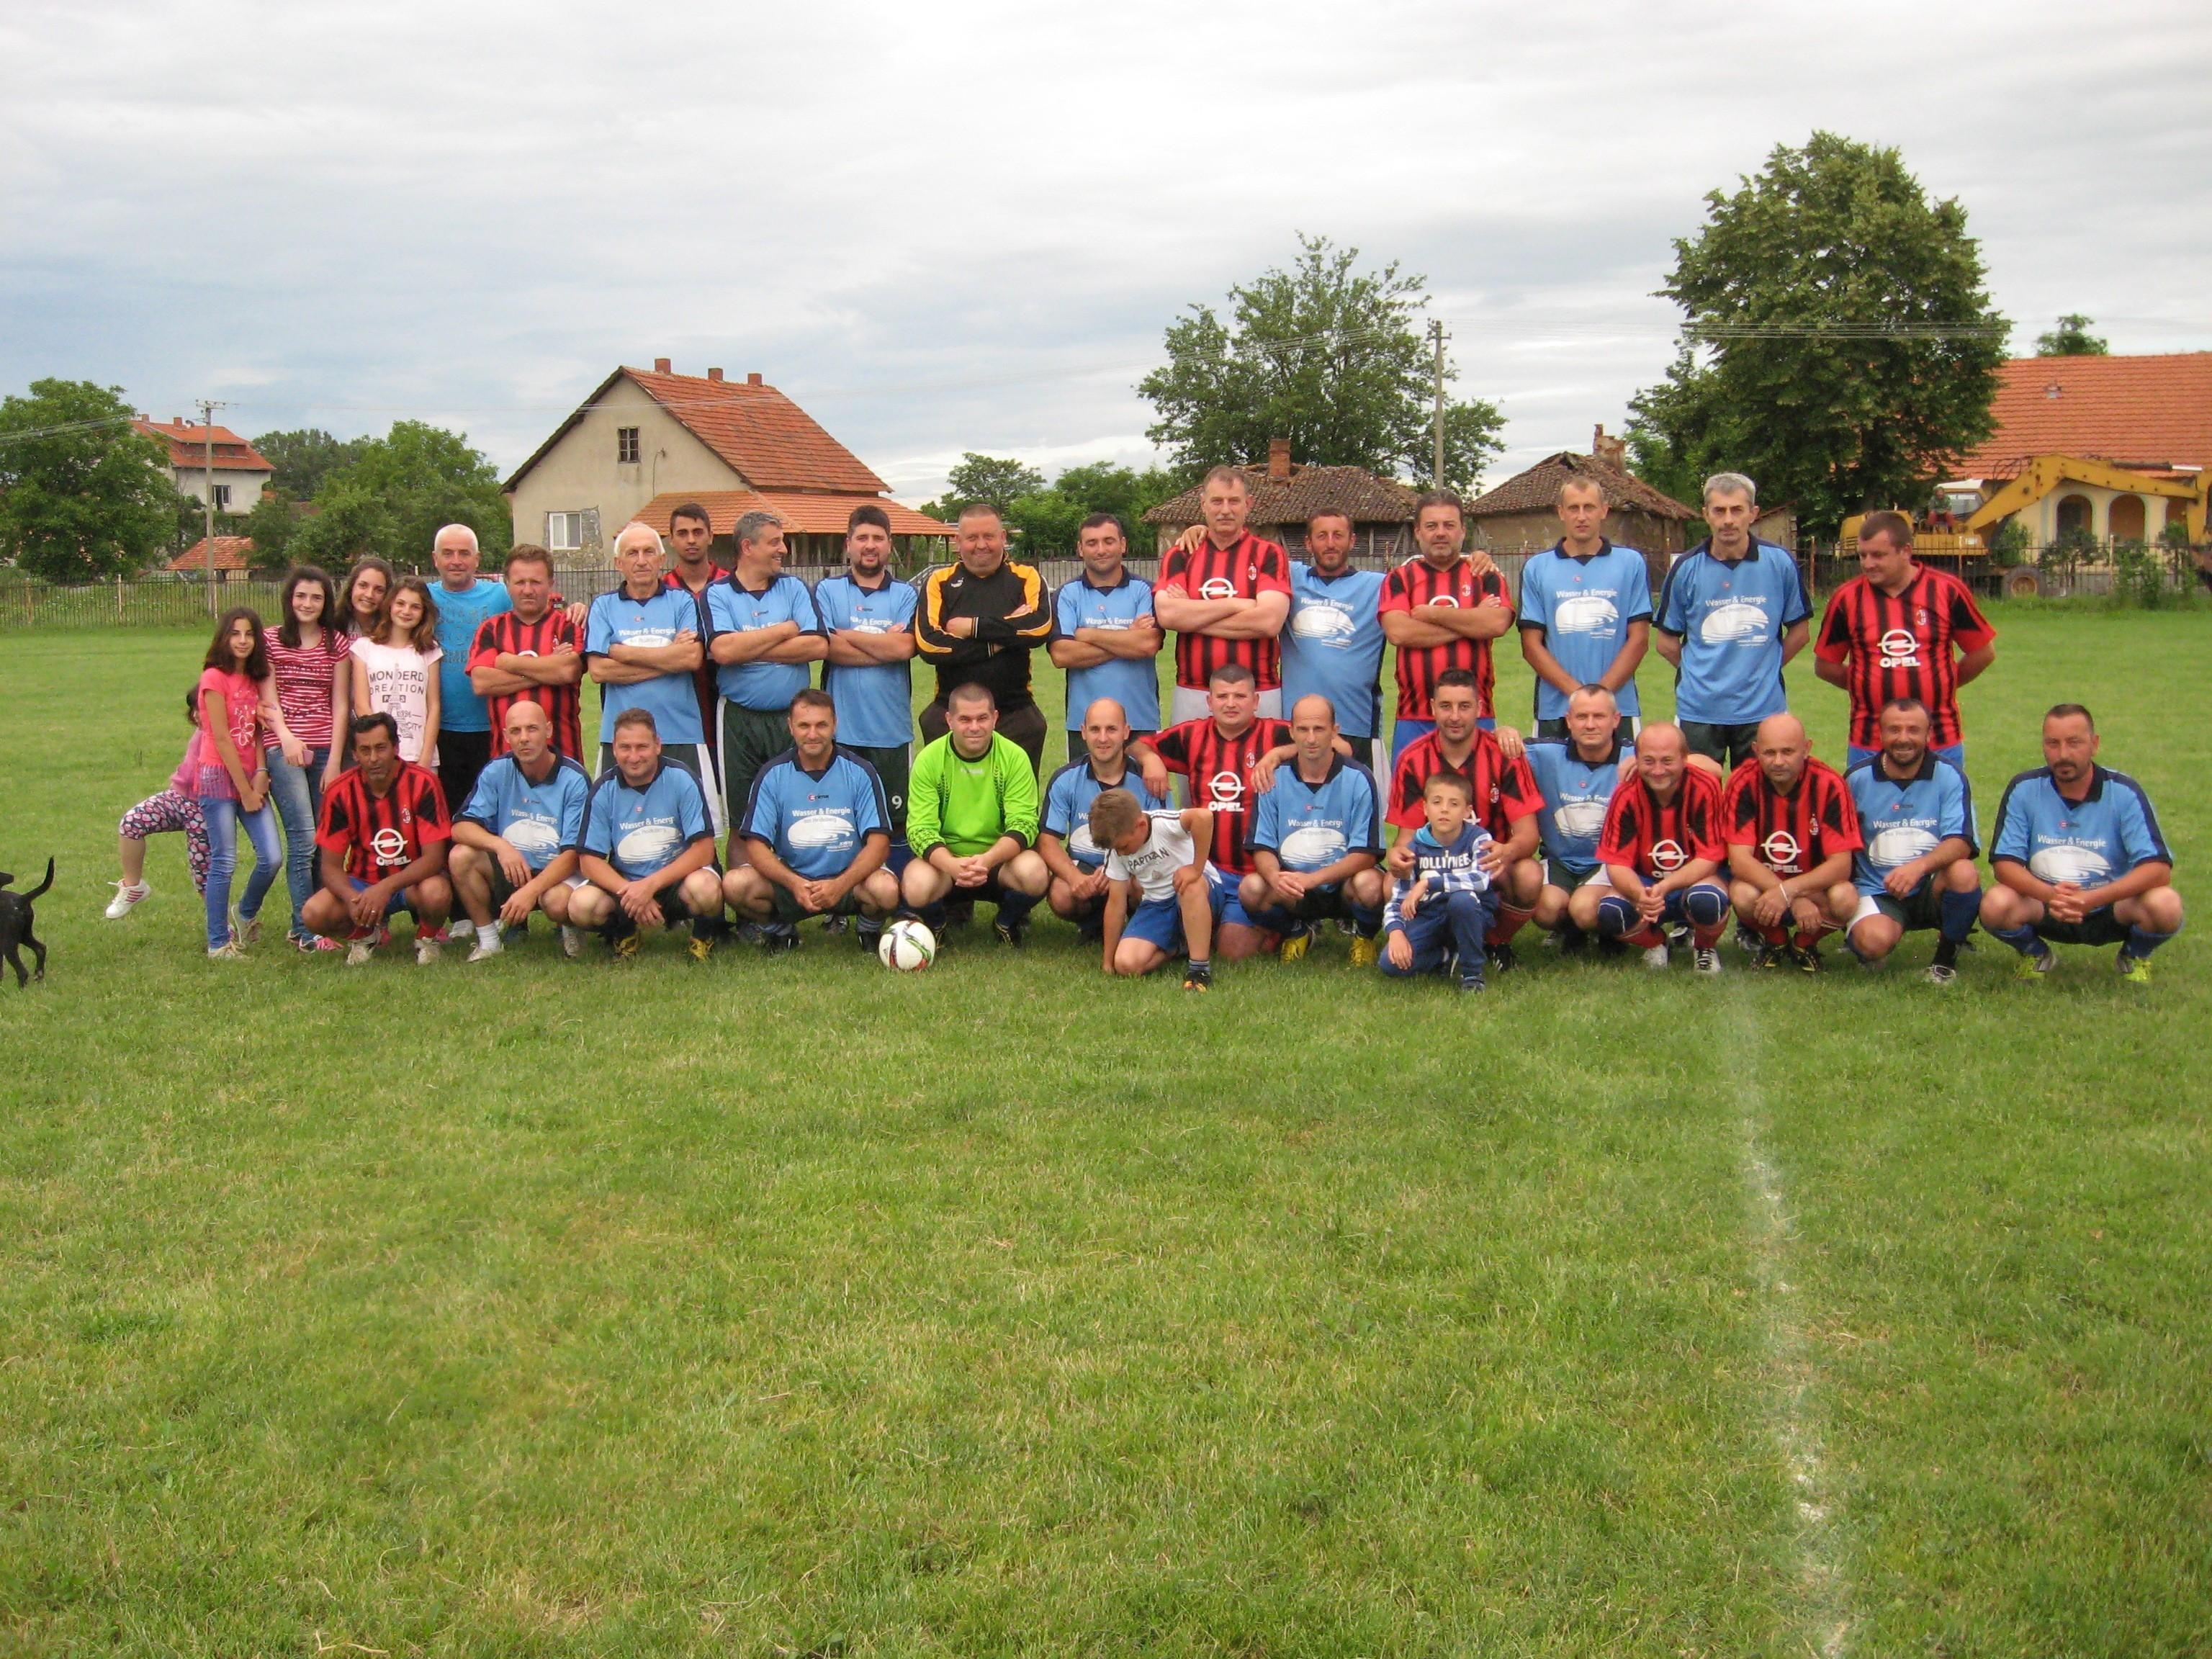 crveno-crni Polet, plavi Jastrebac